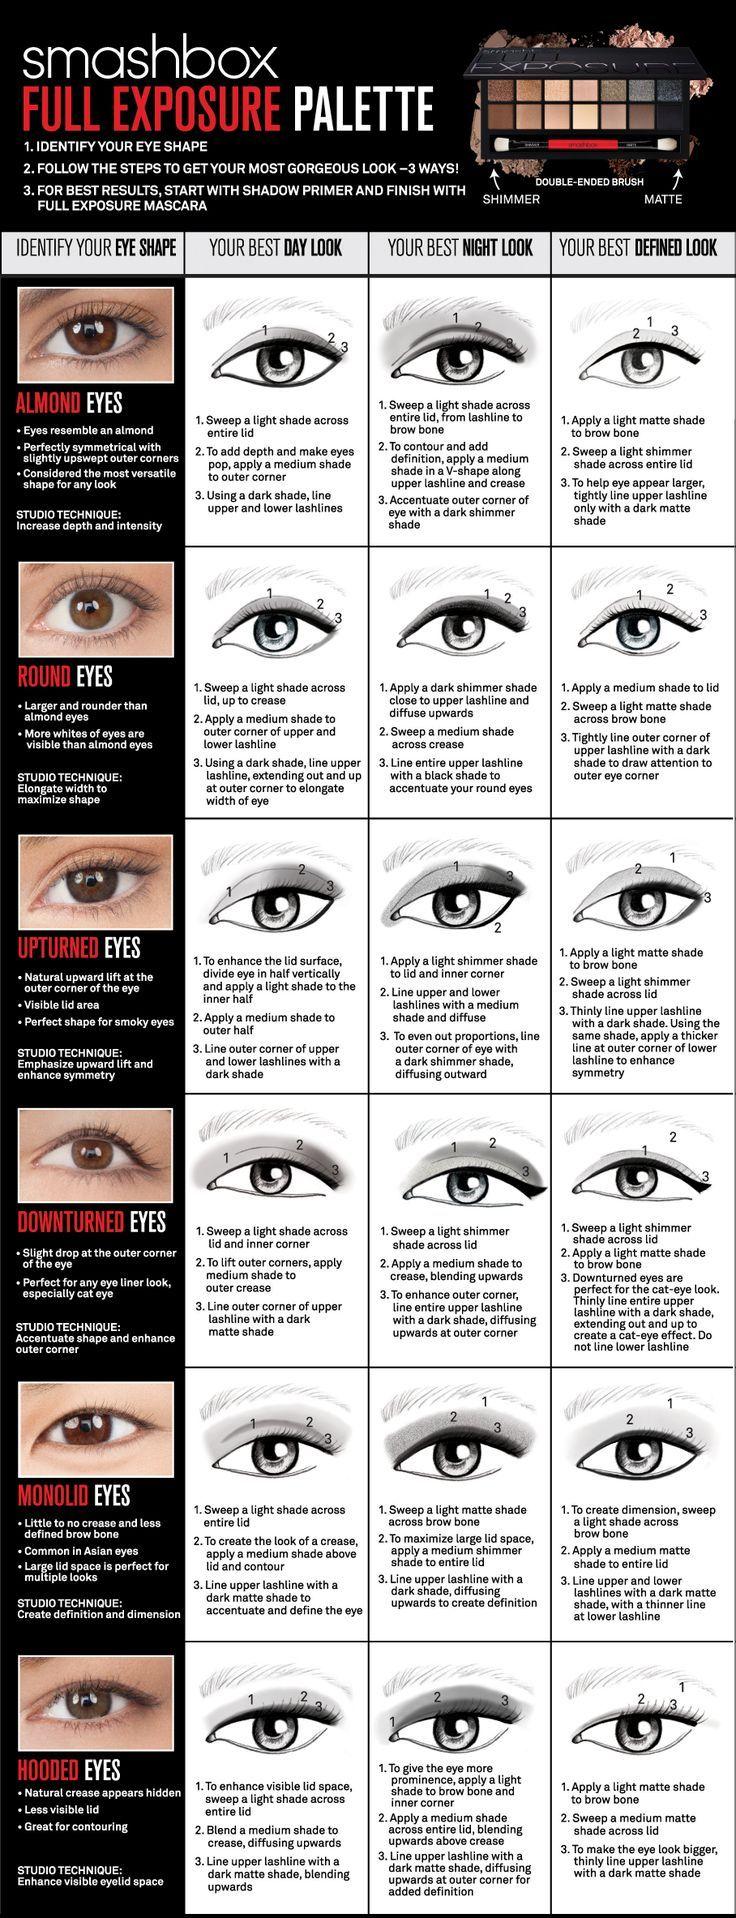 Easy eye chart (almond eye)